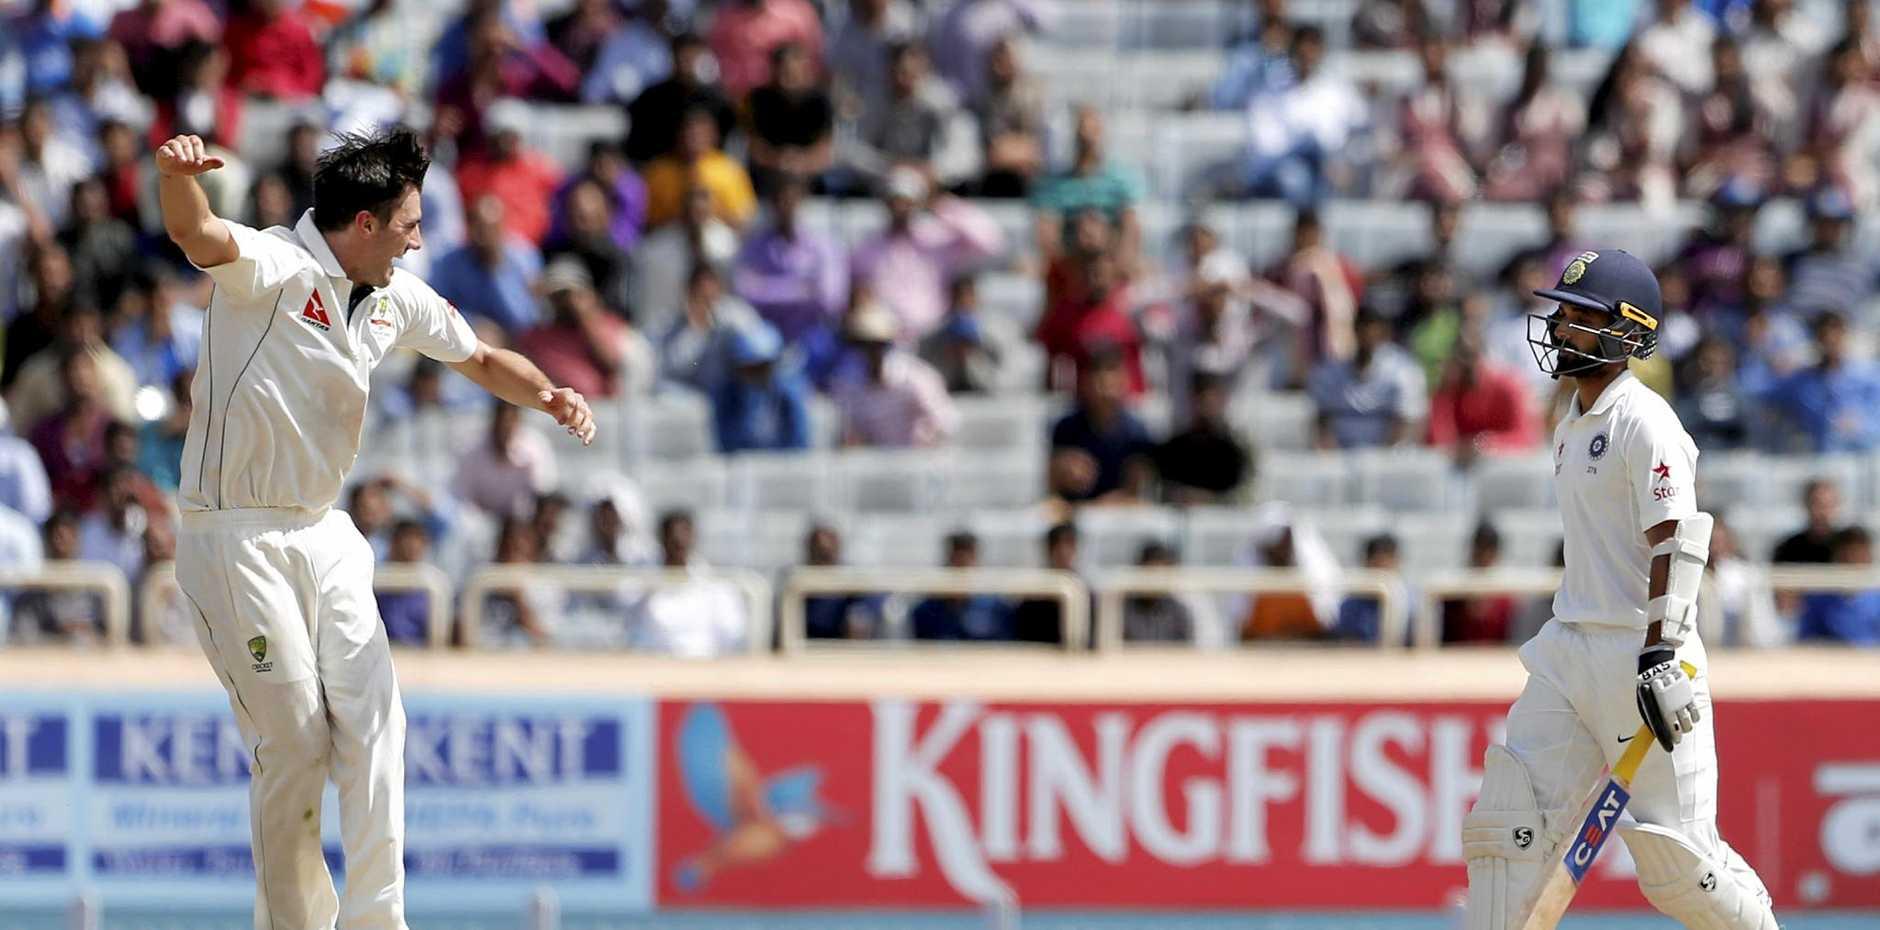 Australia's Pat Cummins celebrates the dismissal of India's Ajinkya Rahane on day three of the third Test in Ranchi.